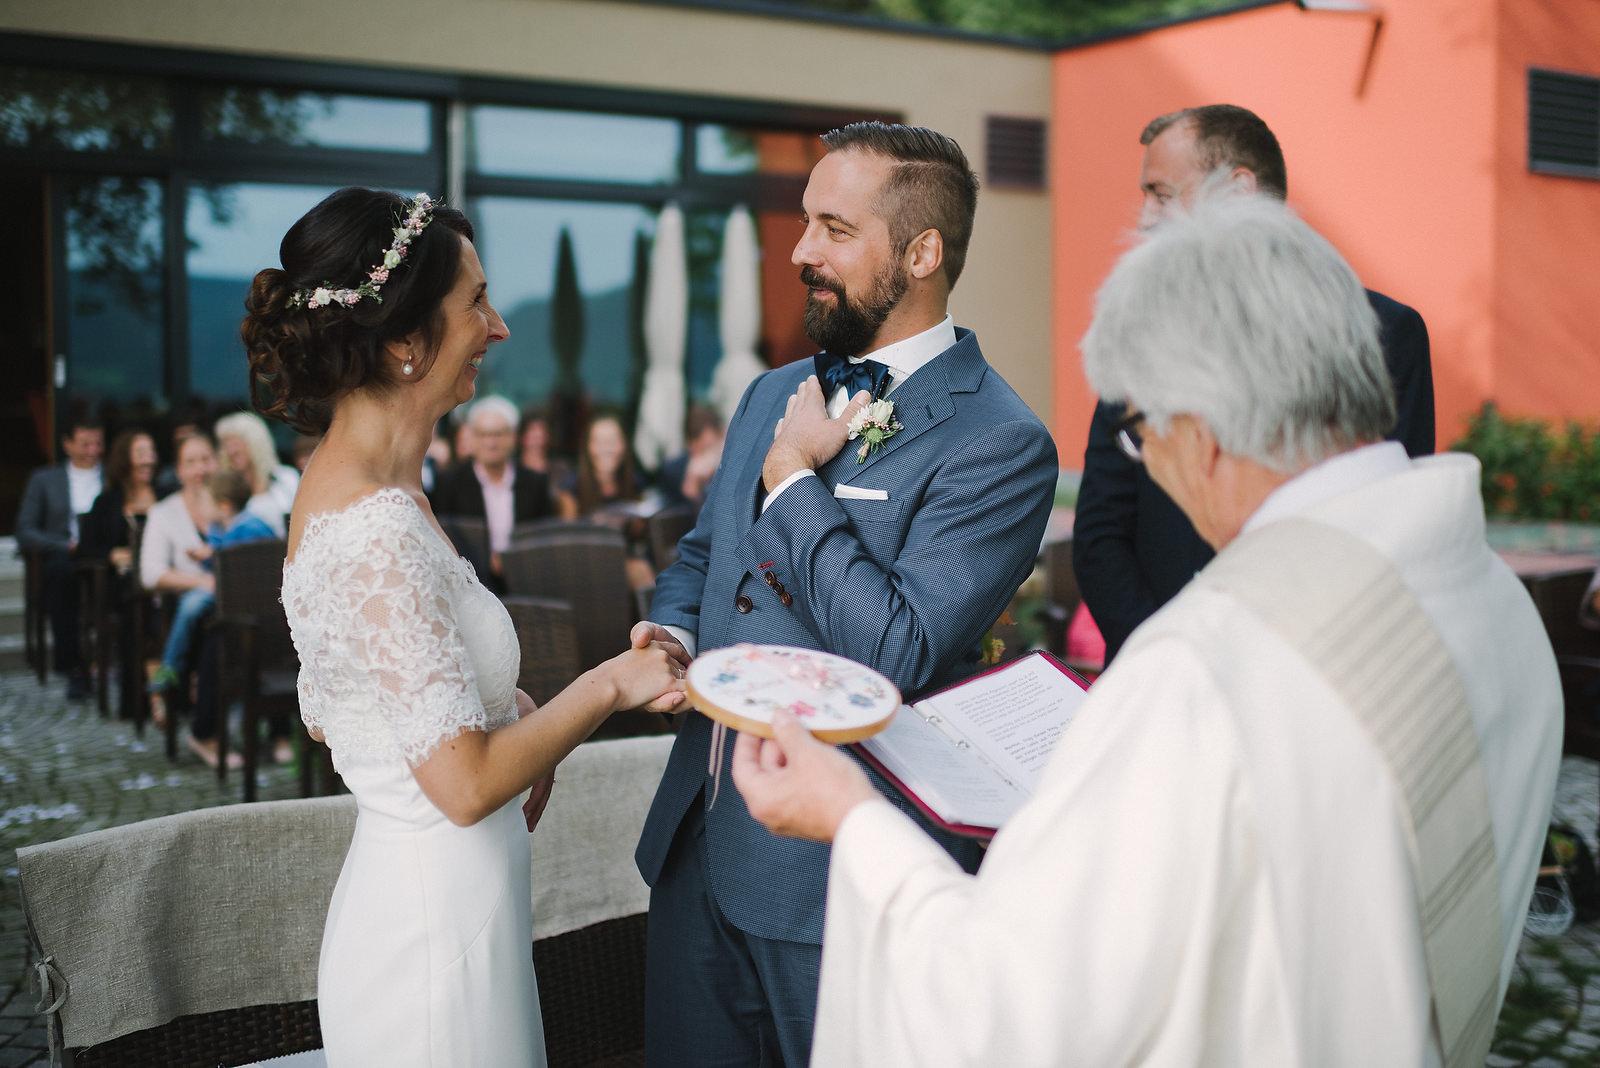 Fotograf Konstanz - Hochzeitsfotograf Reutlingen Achalm Hochzeit EFP 50 - Als Hochzeitsfotograf auf der Achalm, Reutlingen  - 41 -